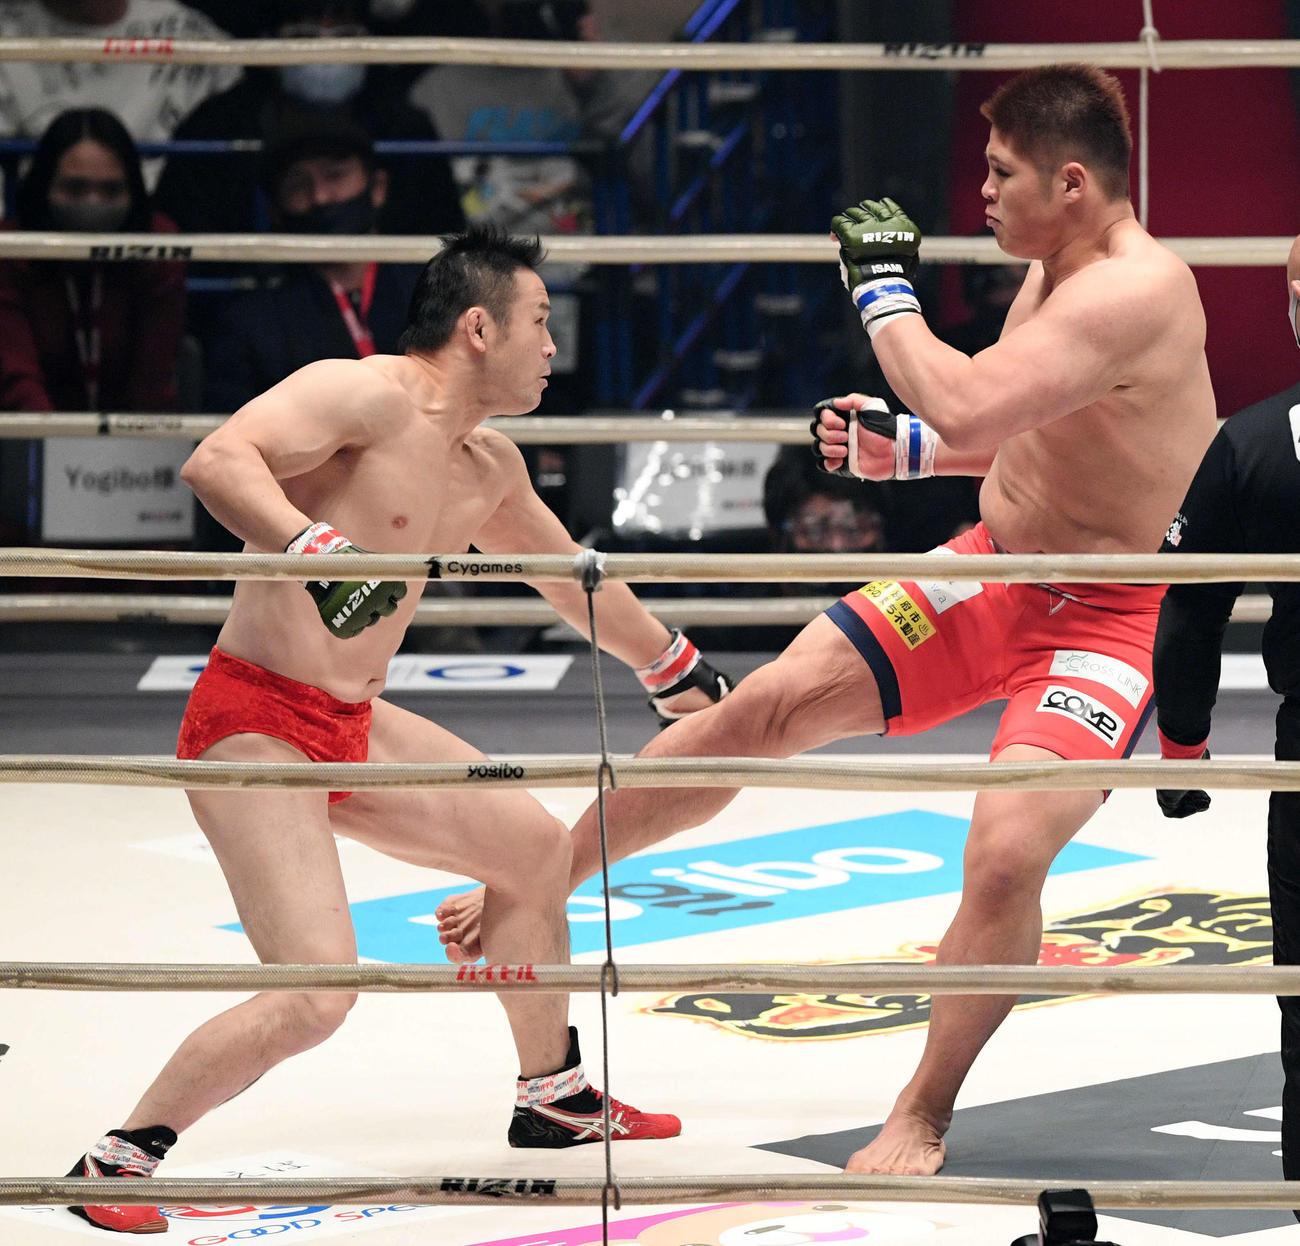 https://www.nikkansports.com/battle/news/img/202012310000312-w1300_0.jpg